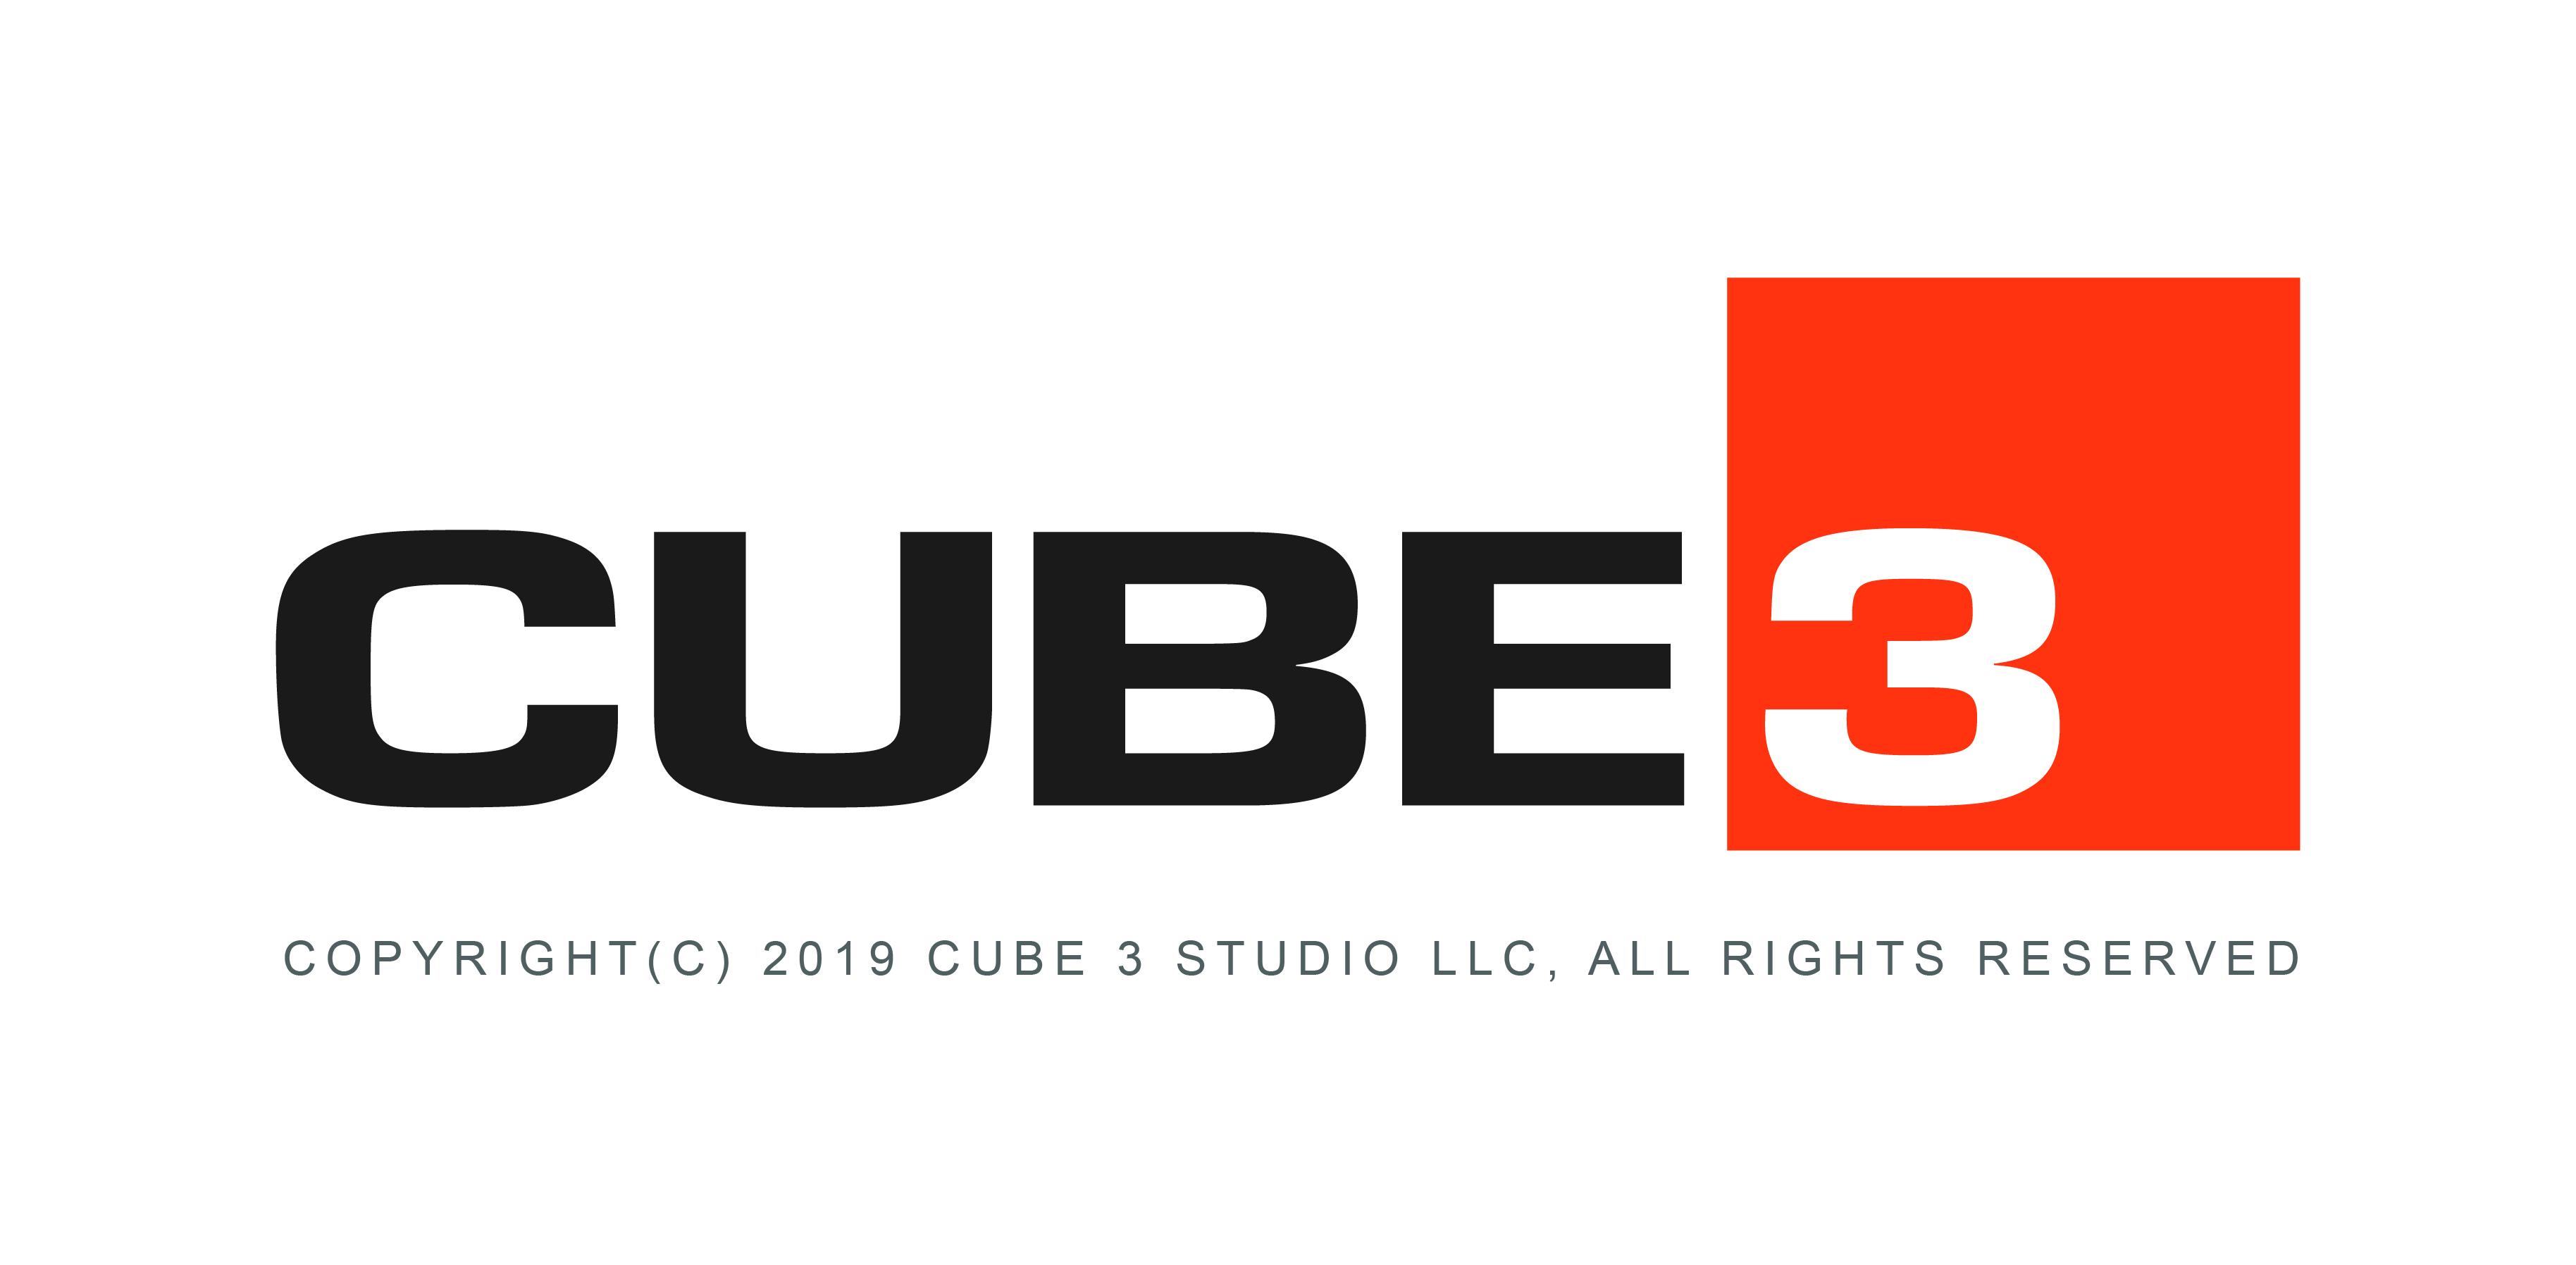 CUBE3 Full Logo Copyright 2019